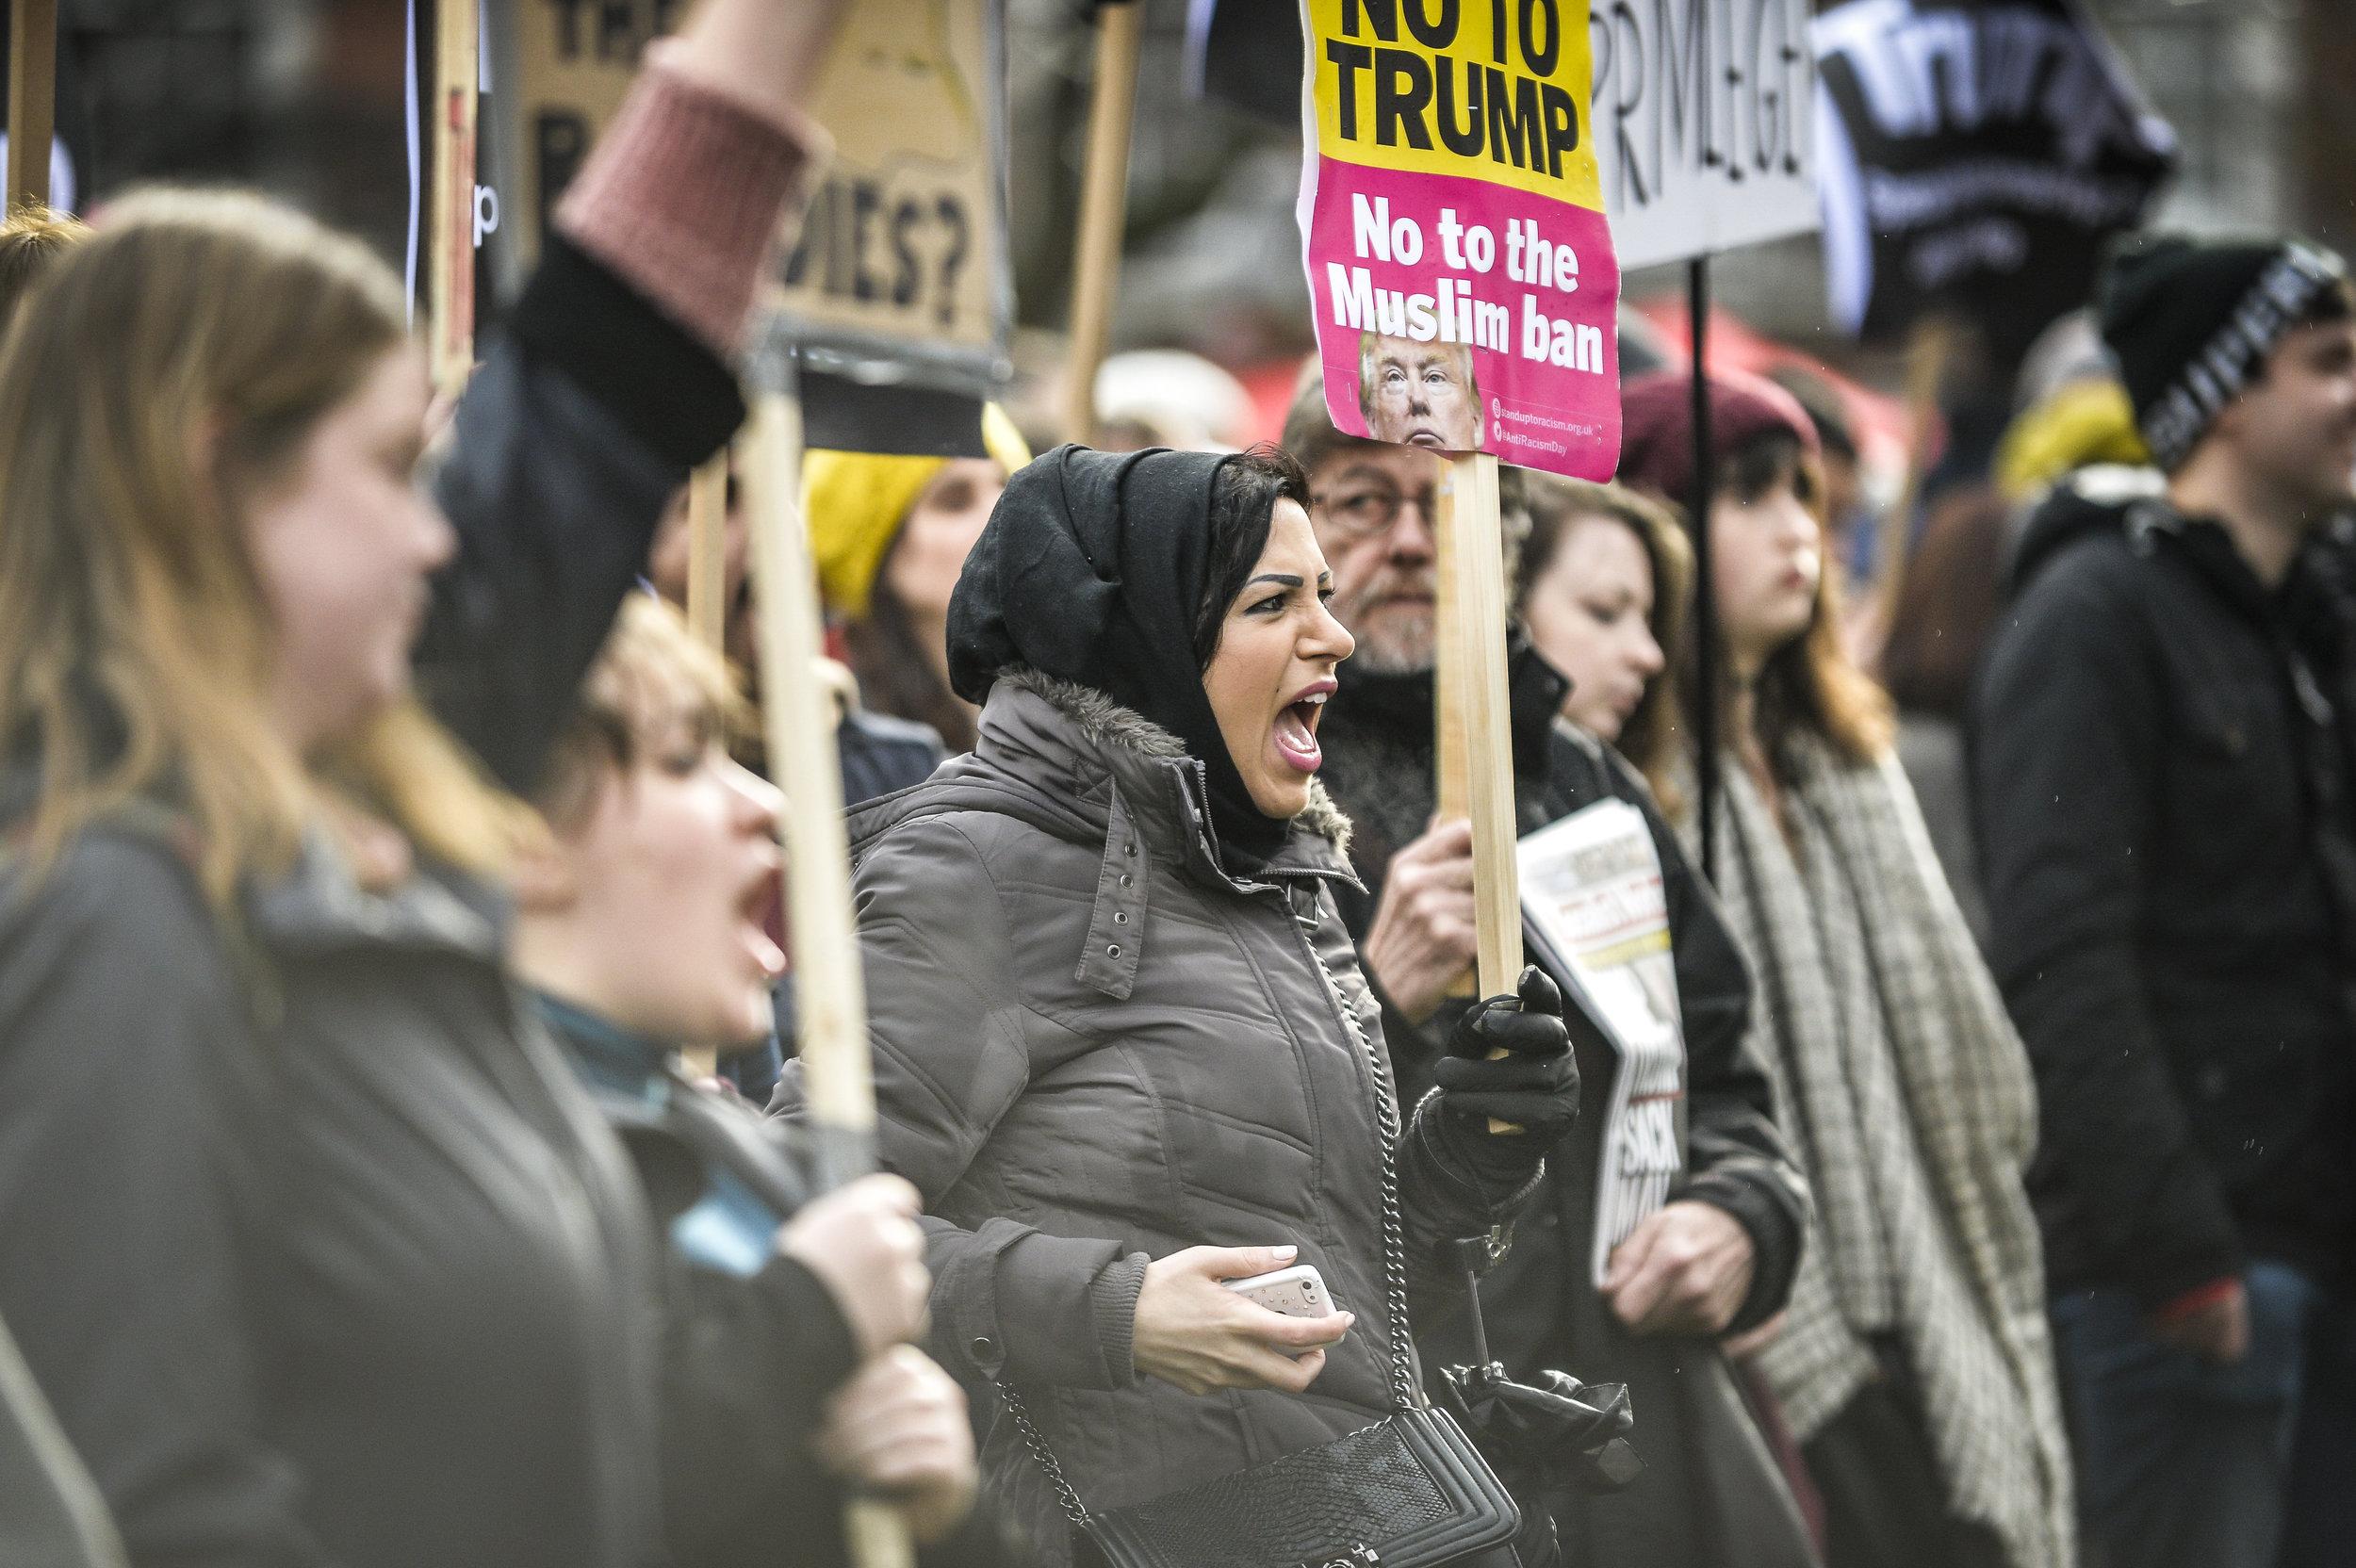 Muslim Ban Protest 040217-7.jpg